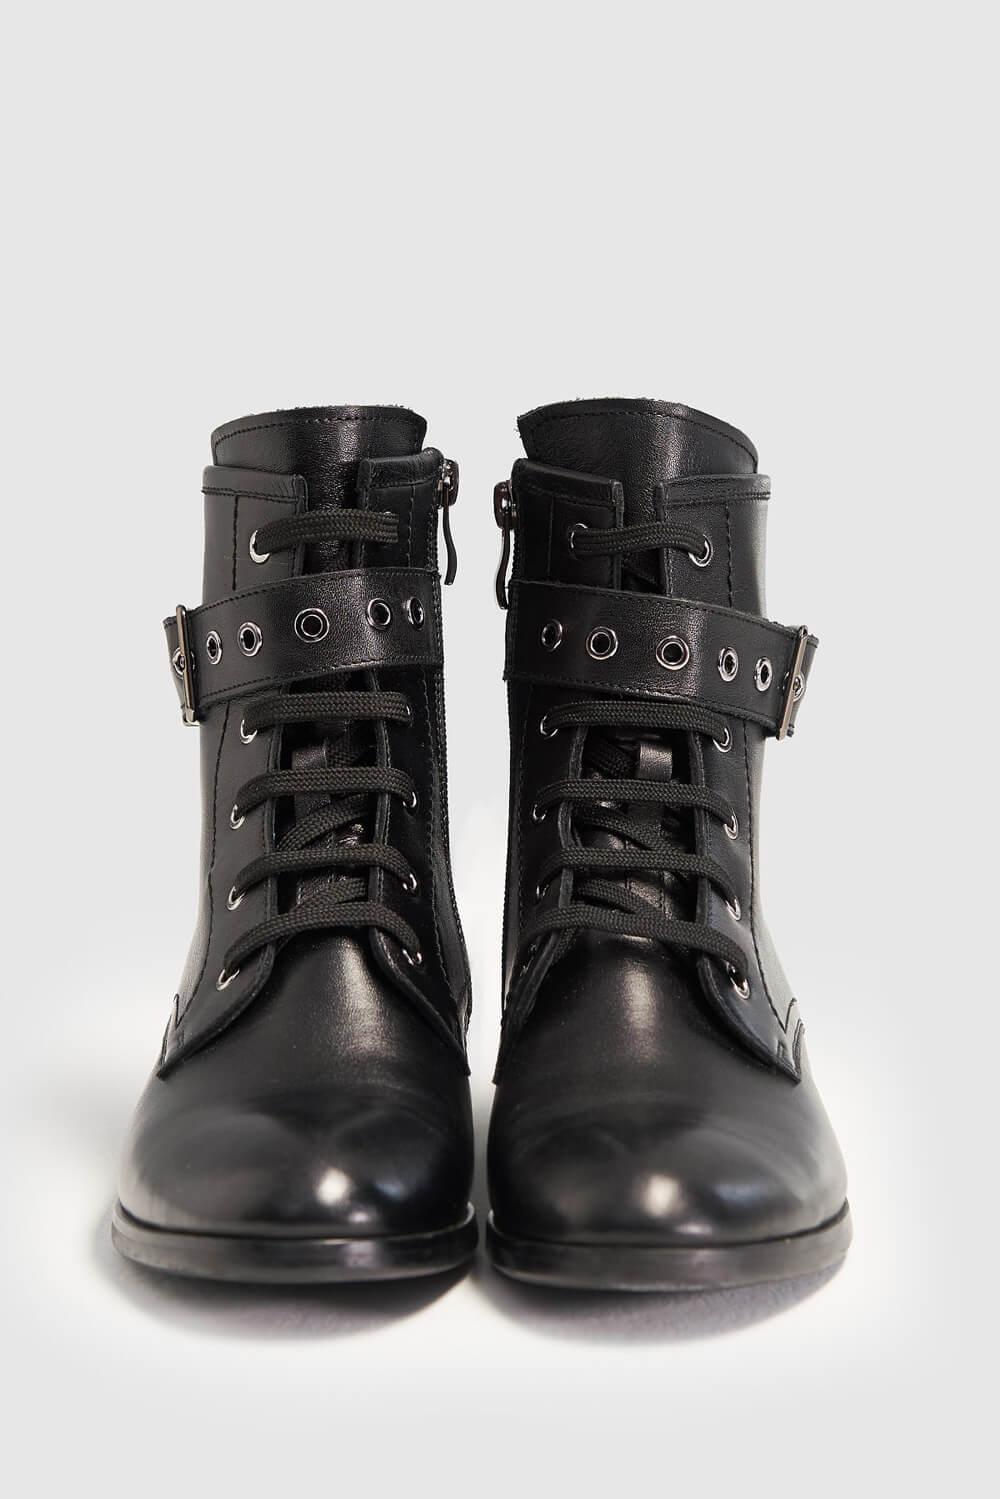 Ботинки для женщин Natali Bolgar BT003KJN1 Заказать, 2017